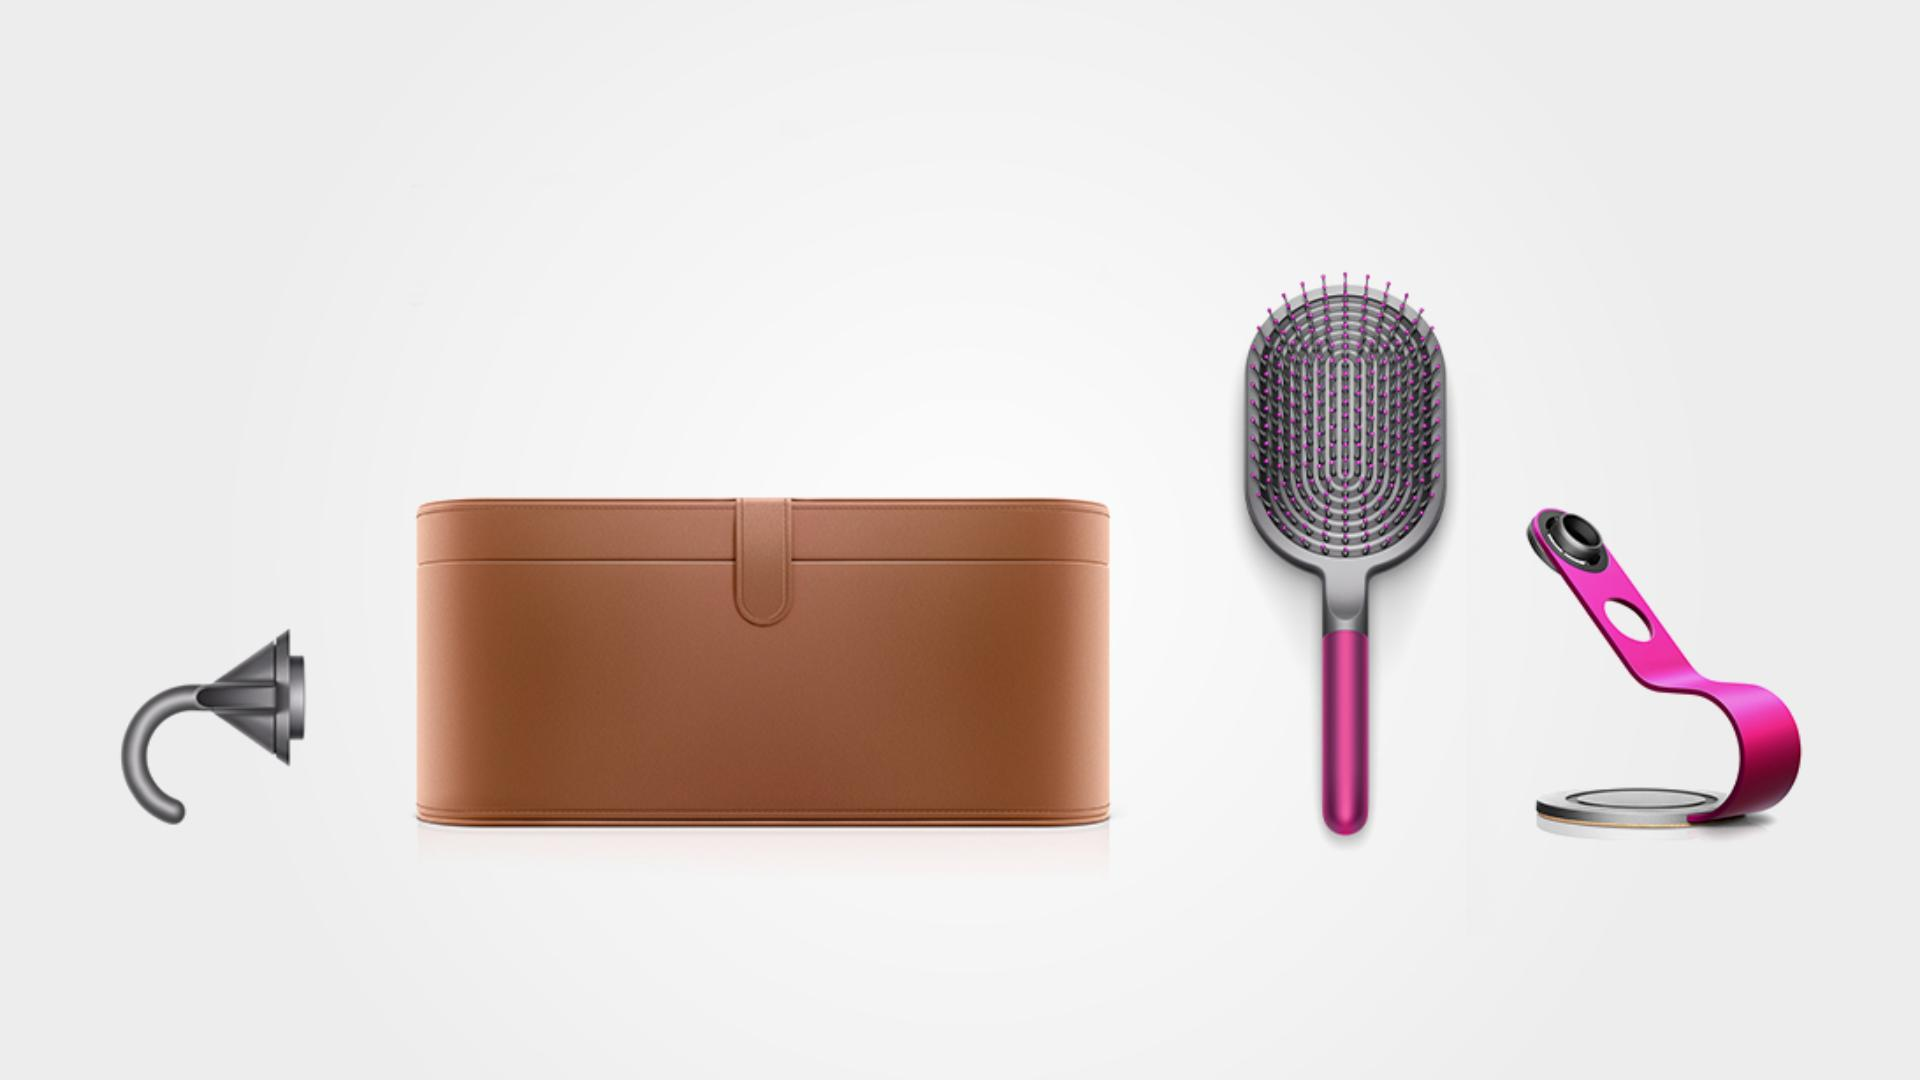 Dyson Supersonic™ hair dryer attachments